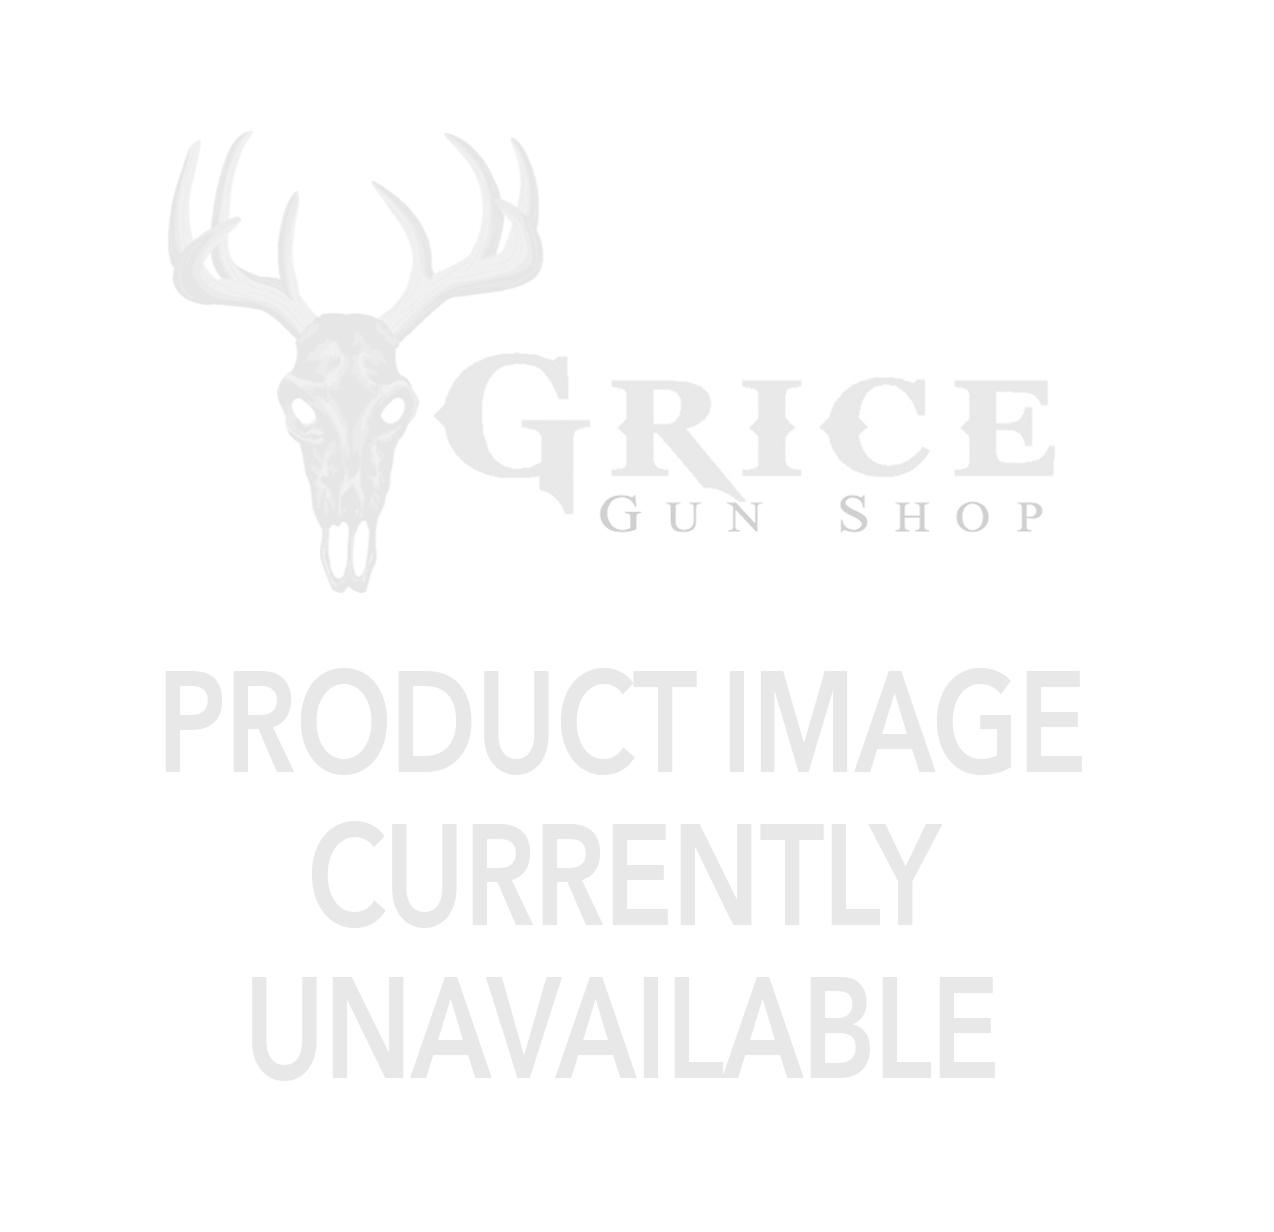 Umarex - H&K MP5SD-22 Retractable Stock 25 Round Capacity